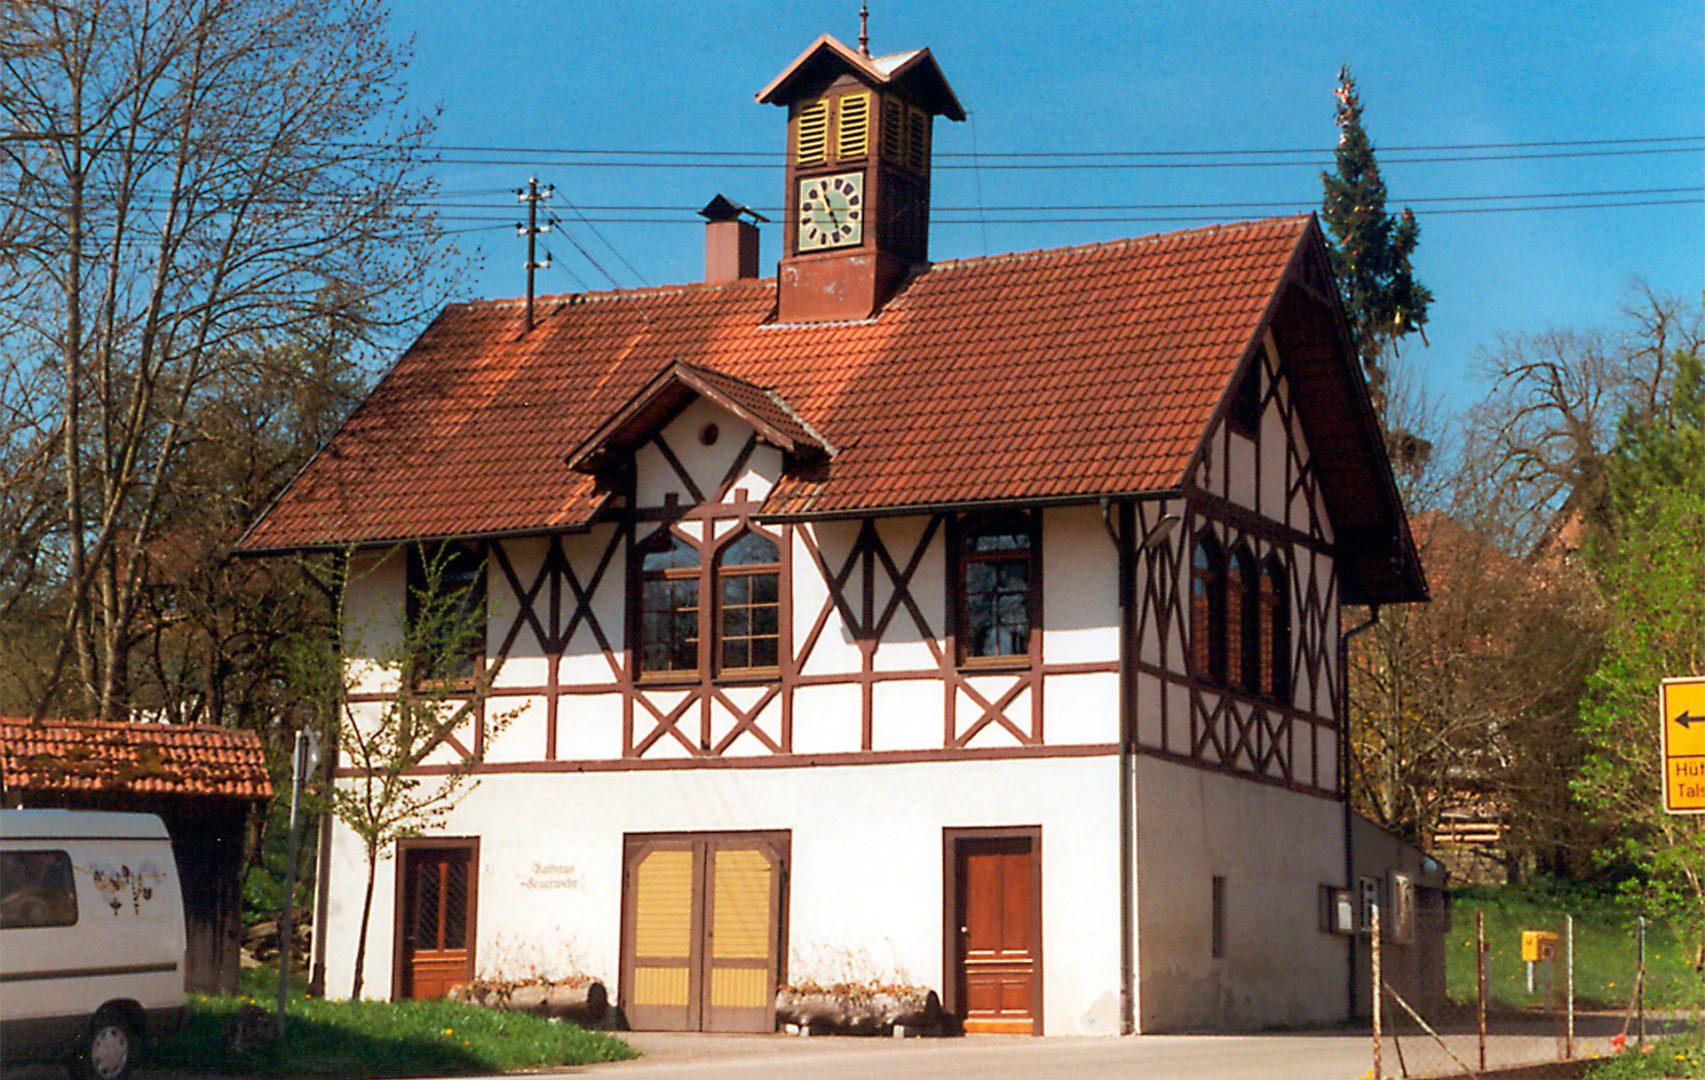 Grötzingen Rathaus